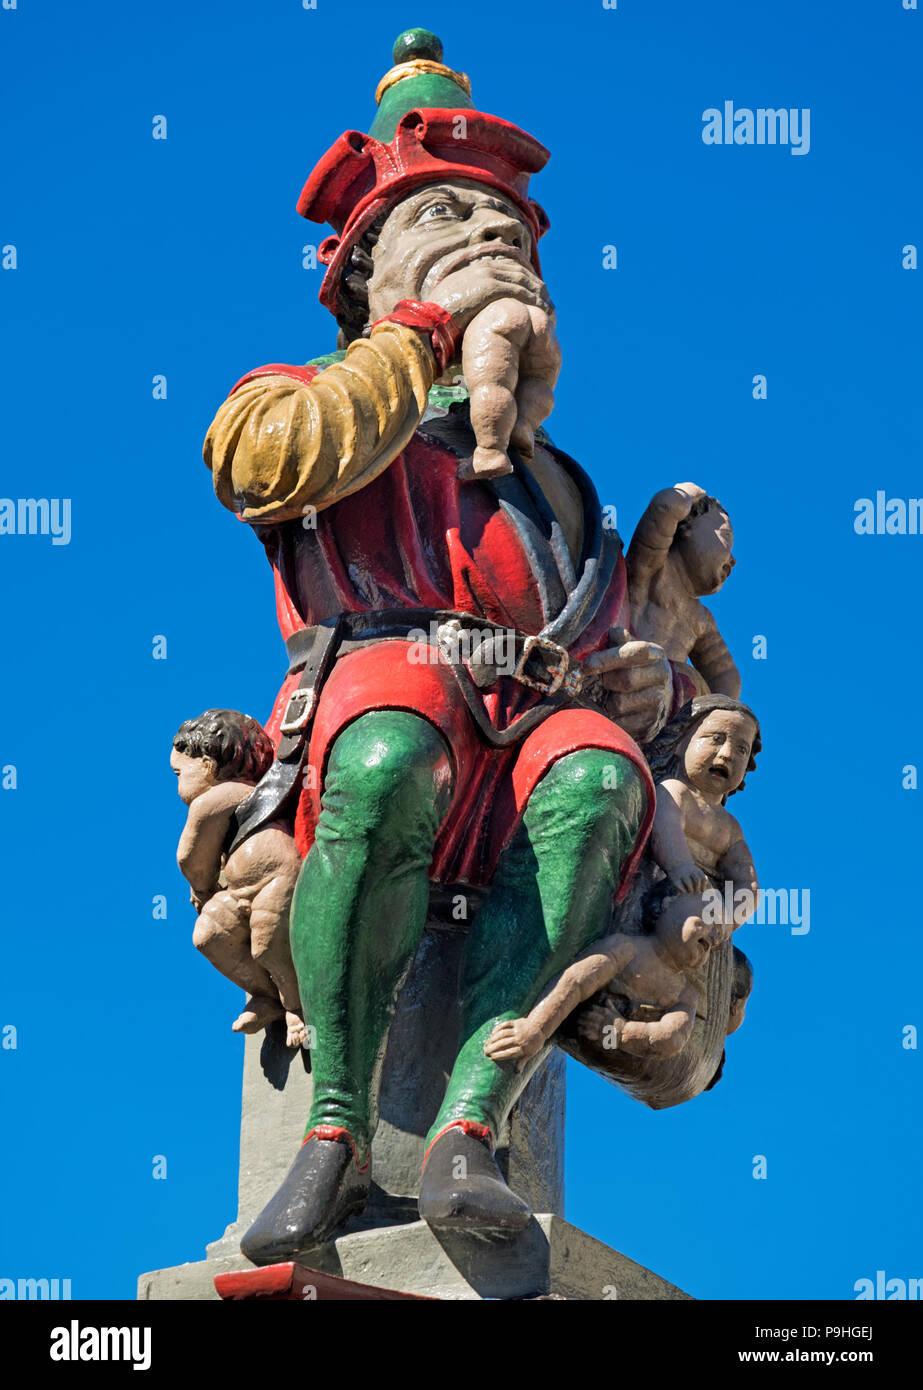 Kindlifresserbrunnen Child Eater Fountain statue Old Town Bern Switzerland - Stock Image